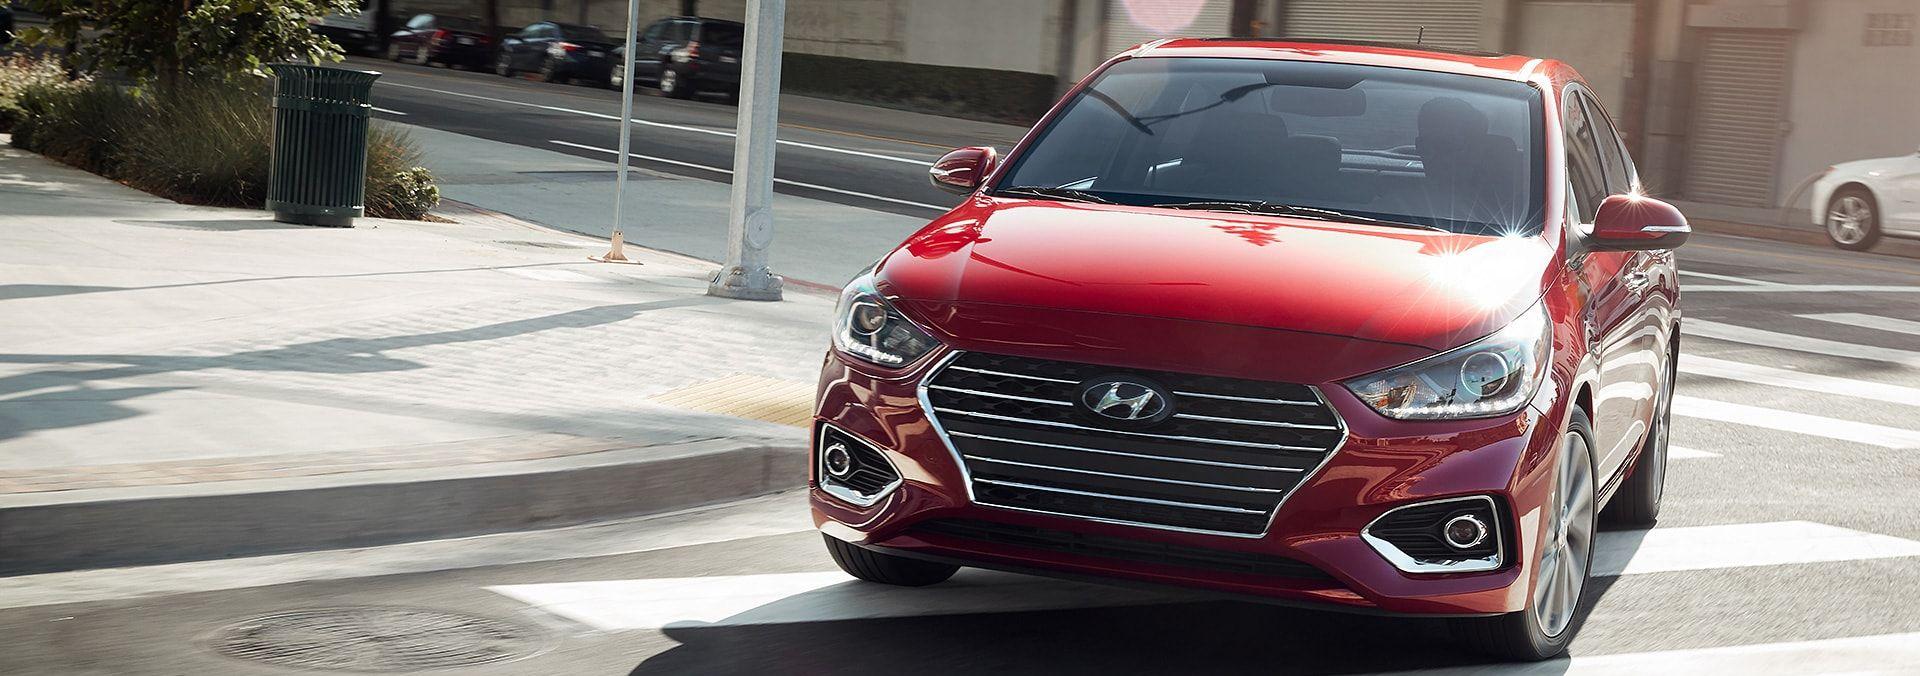 2019 Hyundai Accent Leasing near College Park, MD